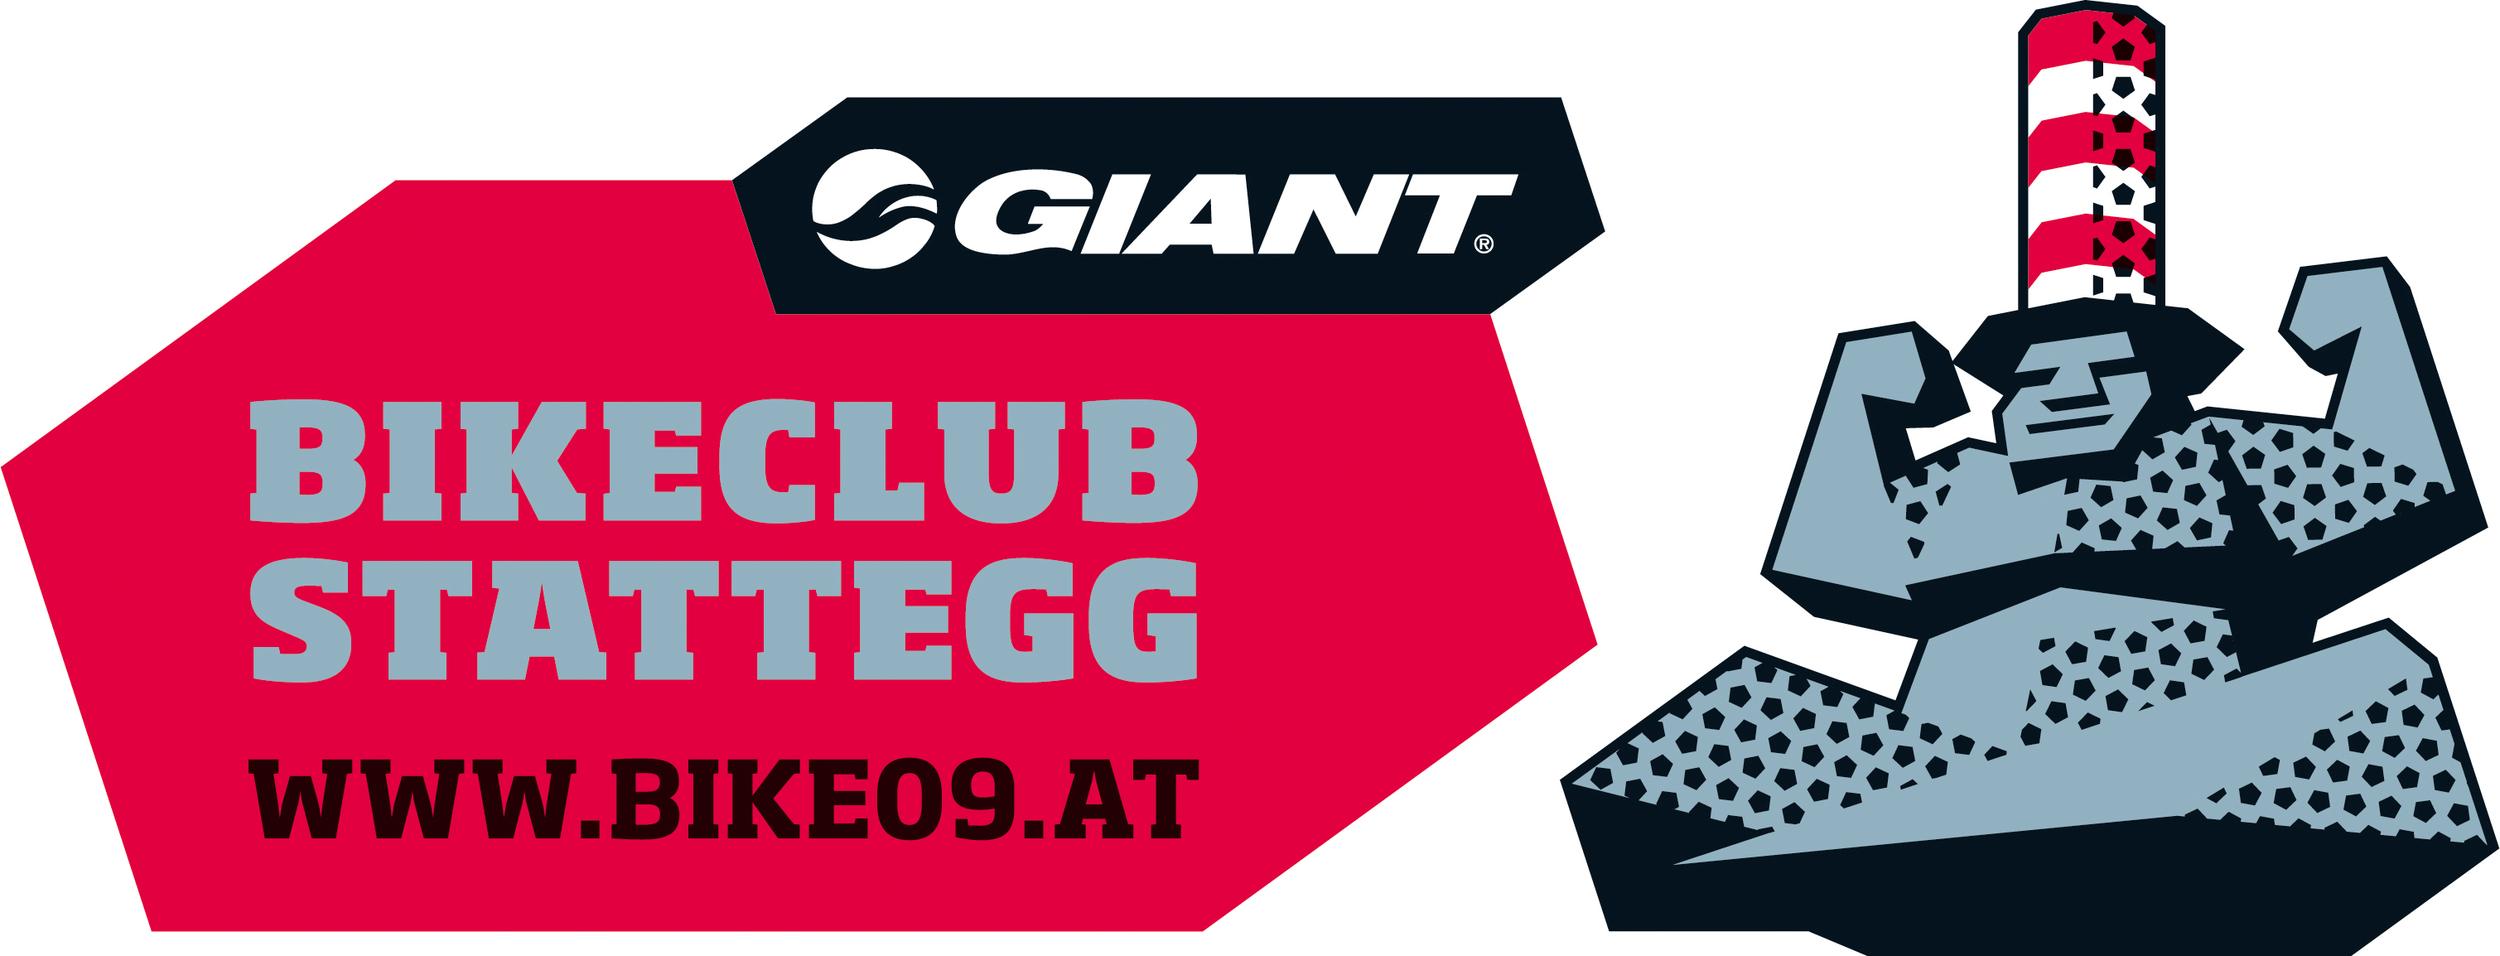 UEC European Youth MTB Championships Graz/Stattegg, 15. - 19. August